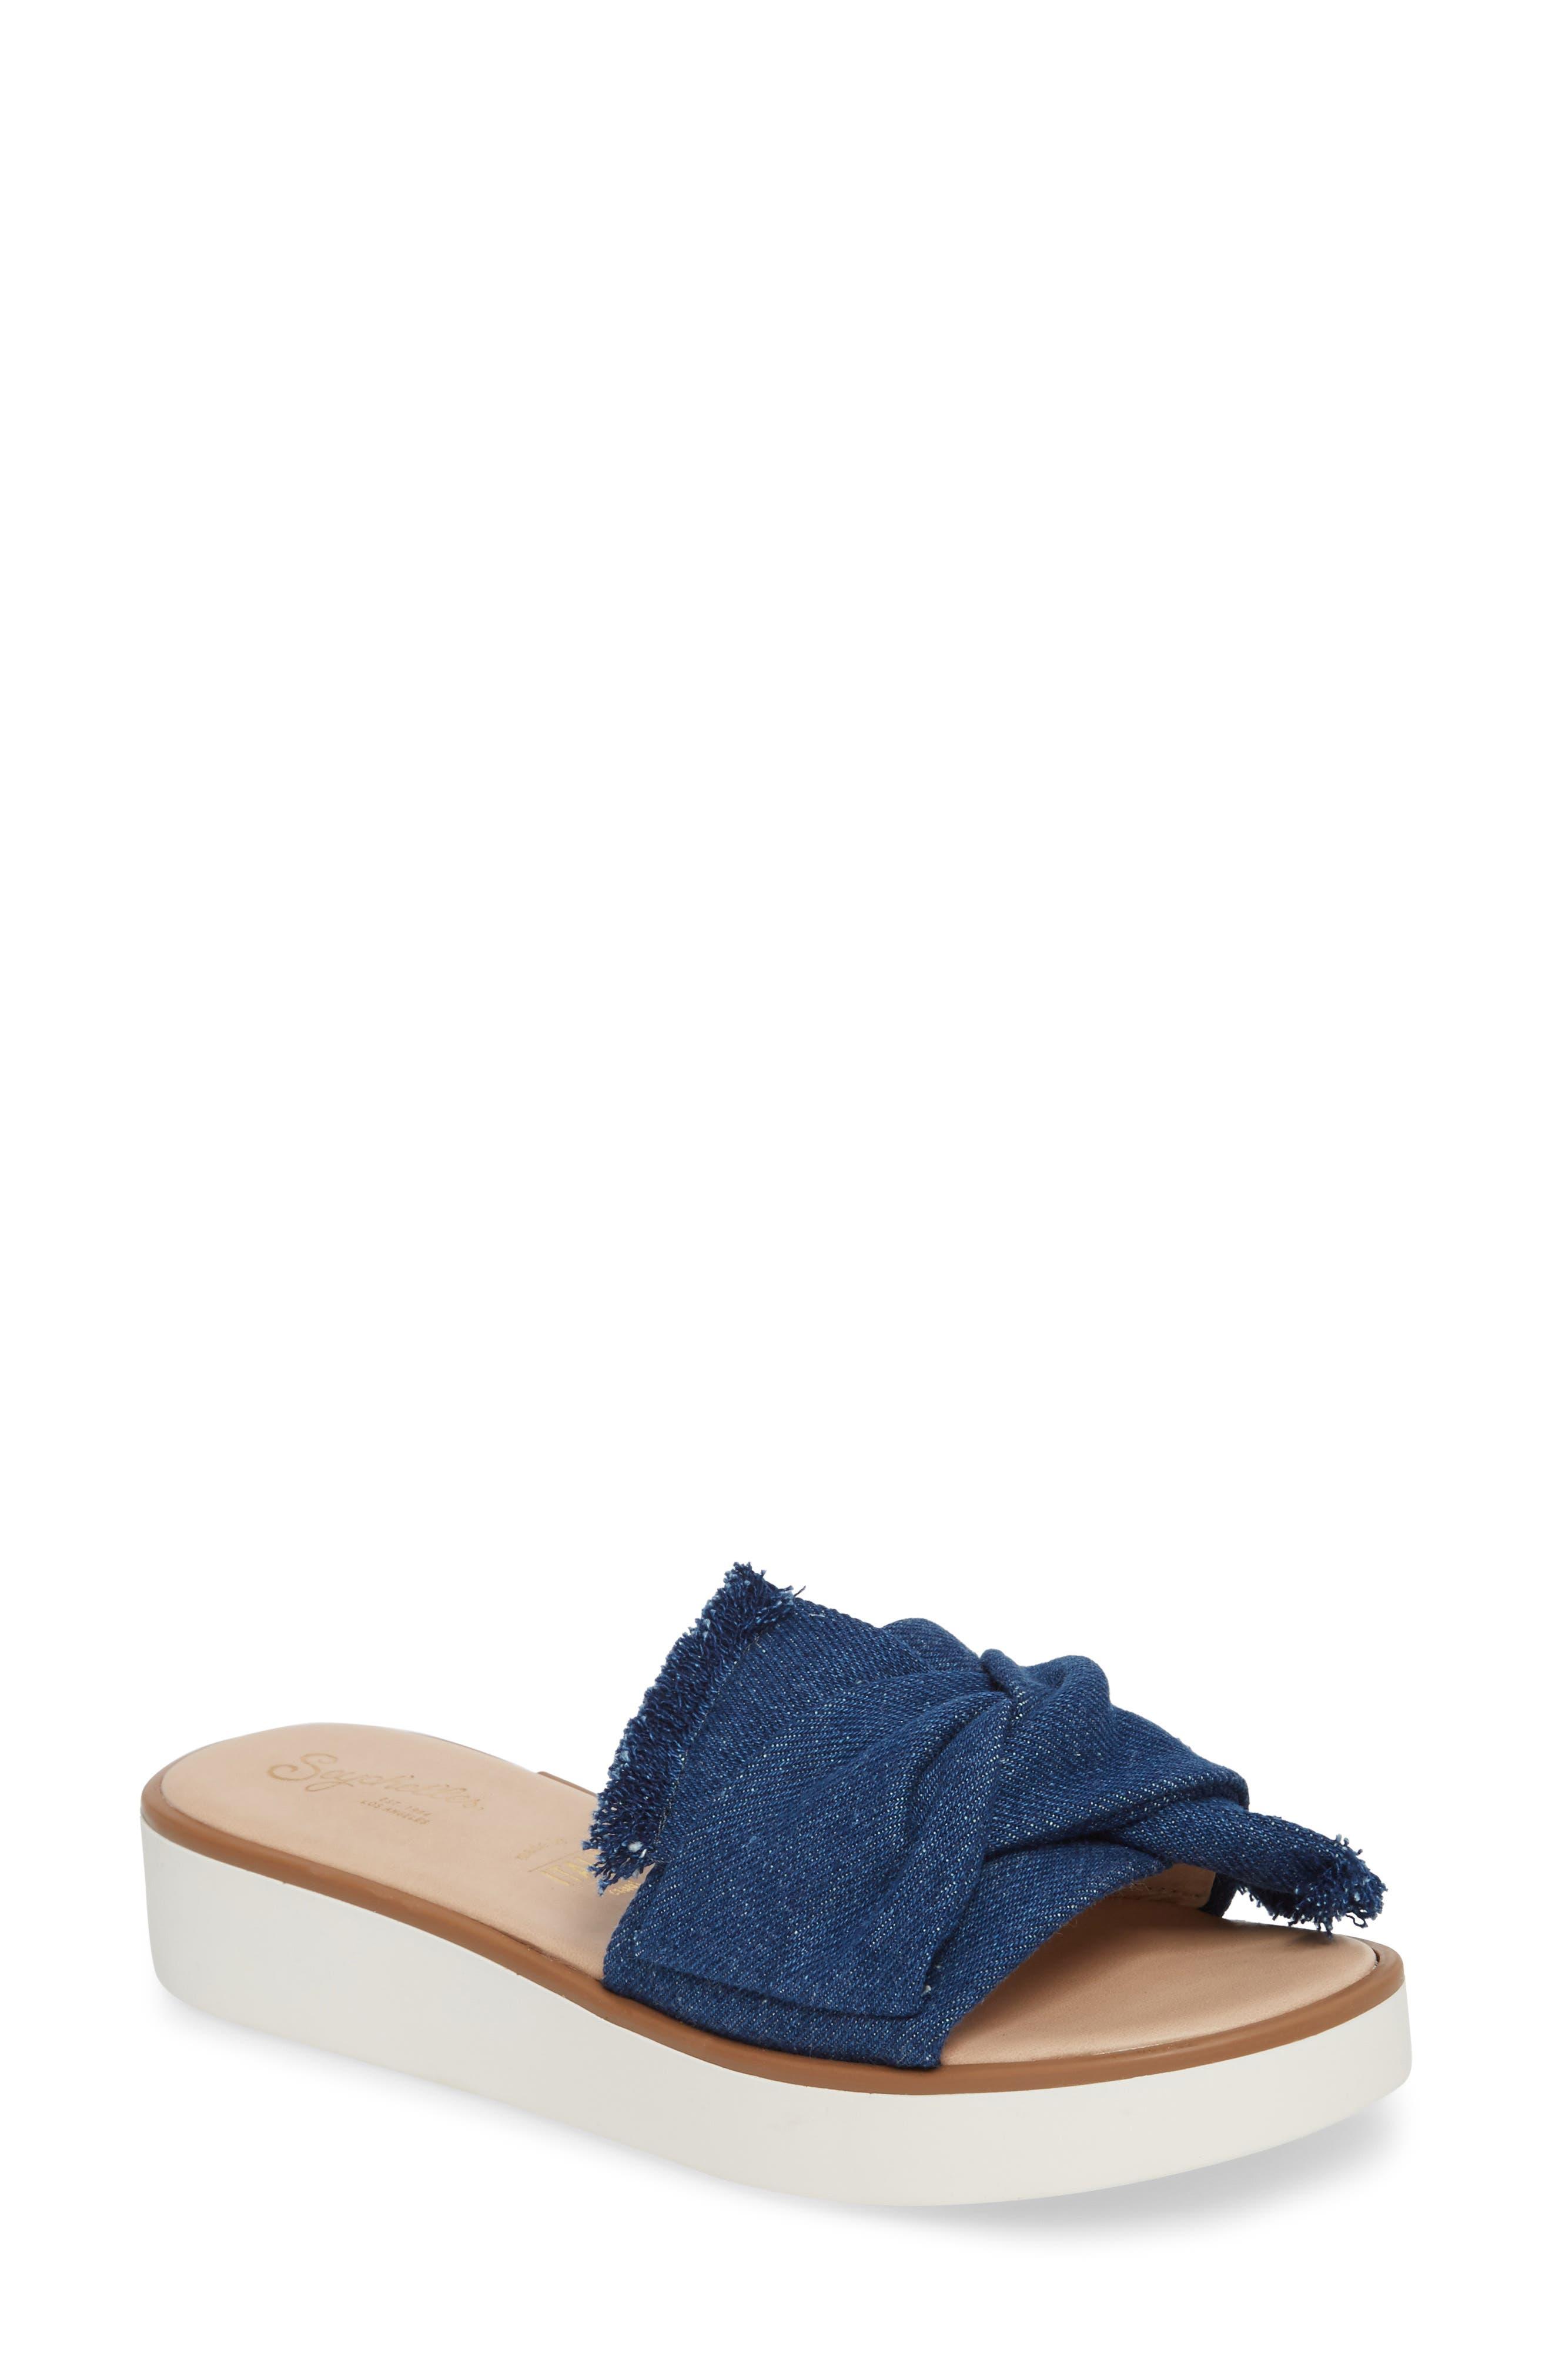 Coast II Slide Sandal,                         Main,                         color, Denim Frayed Fabric